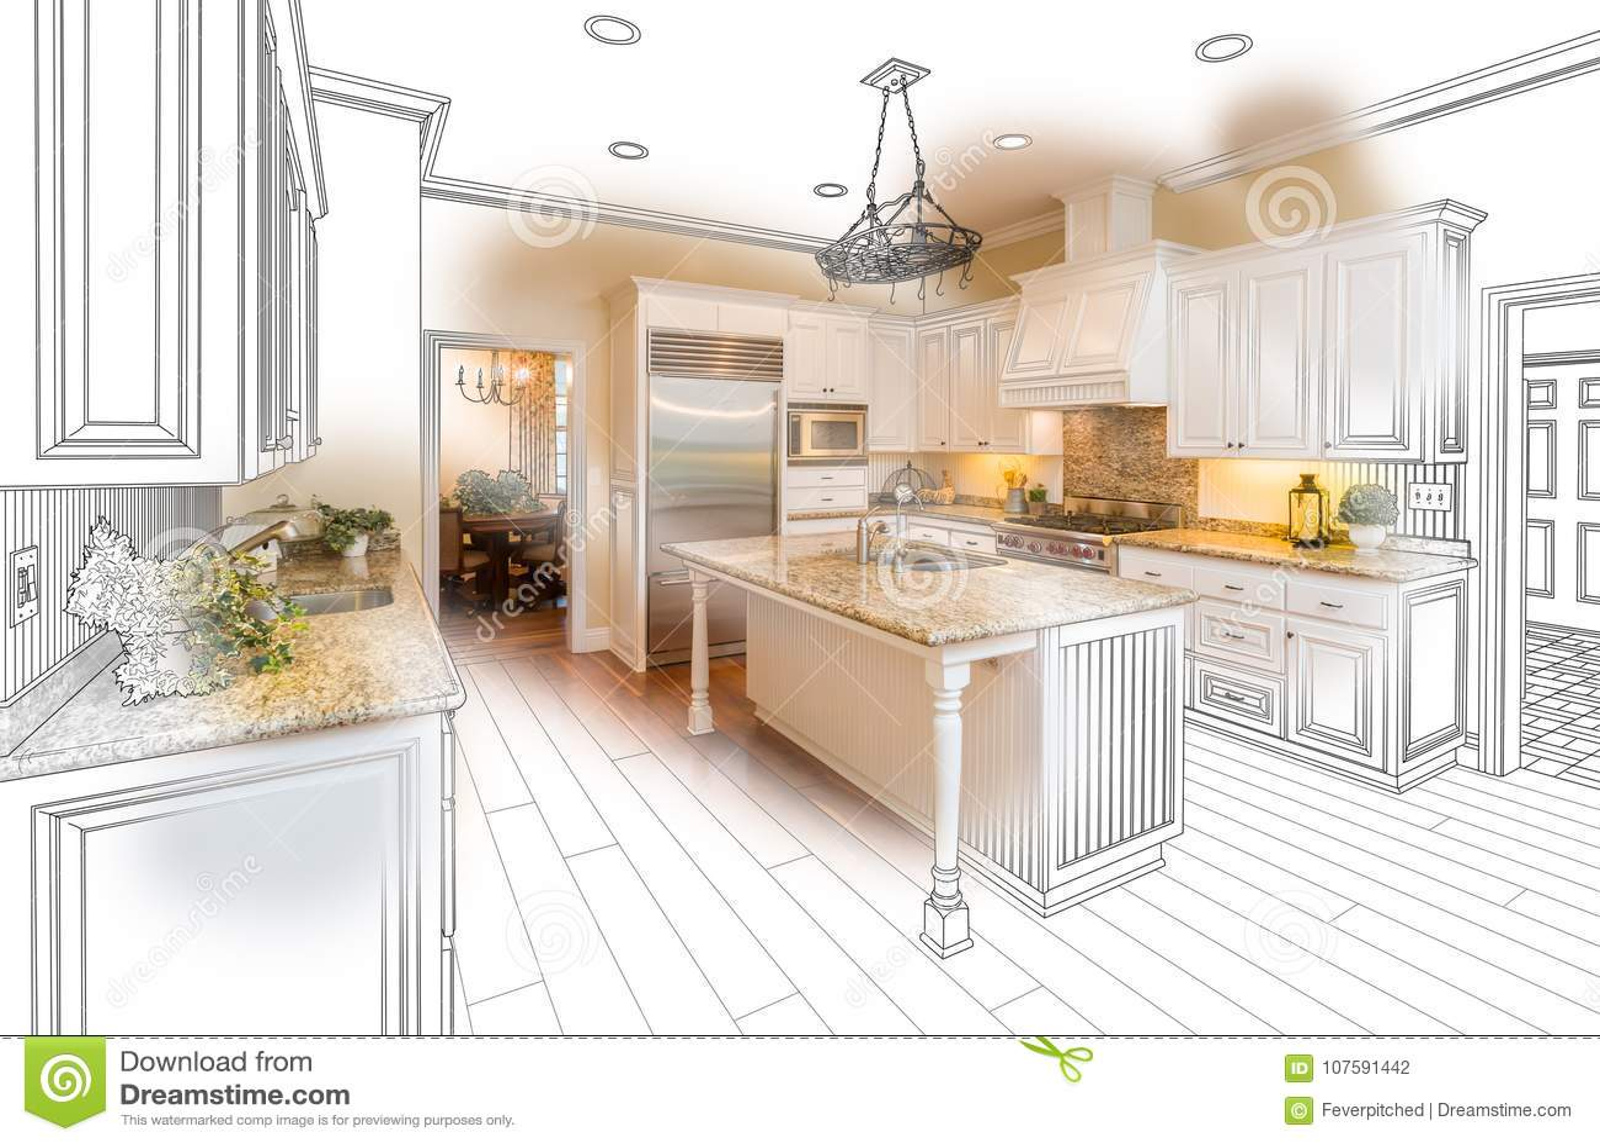 Beautiful Custom Kitchen Drawing and Photo Combination on White.